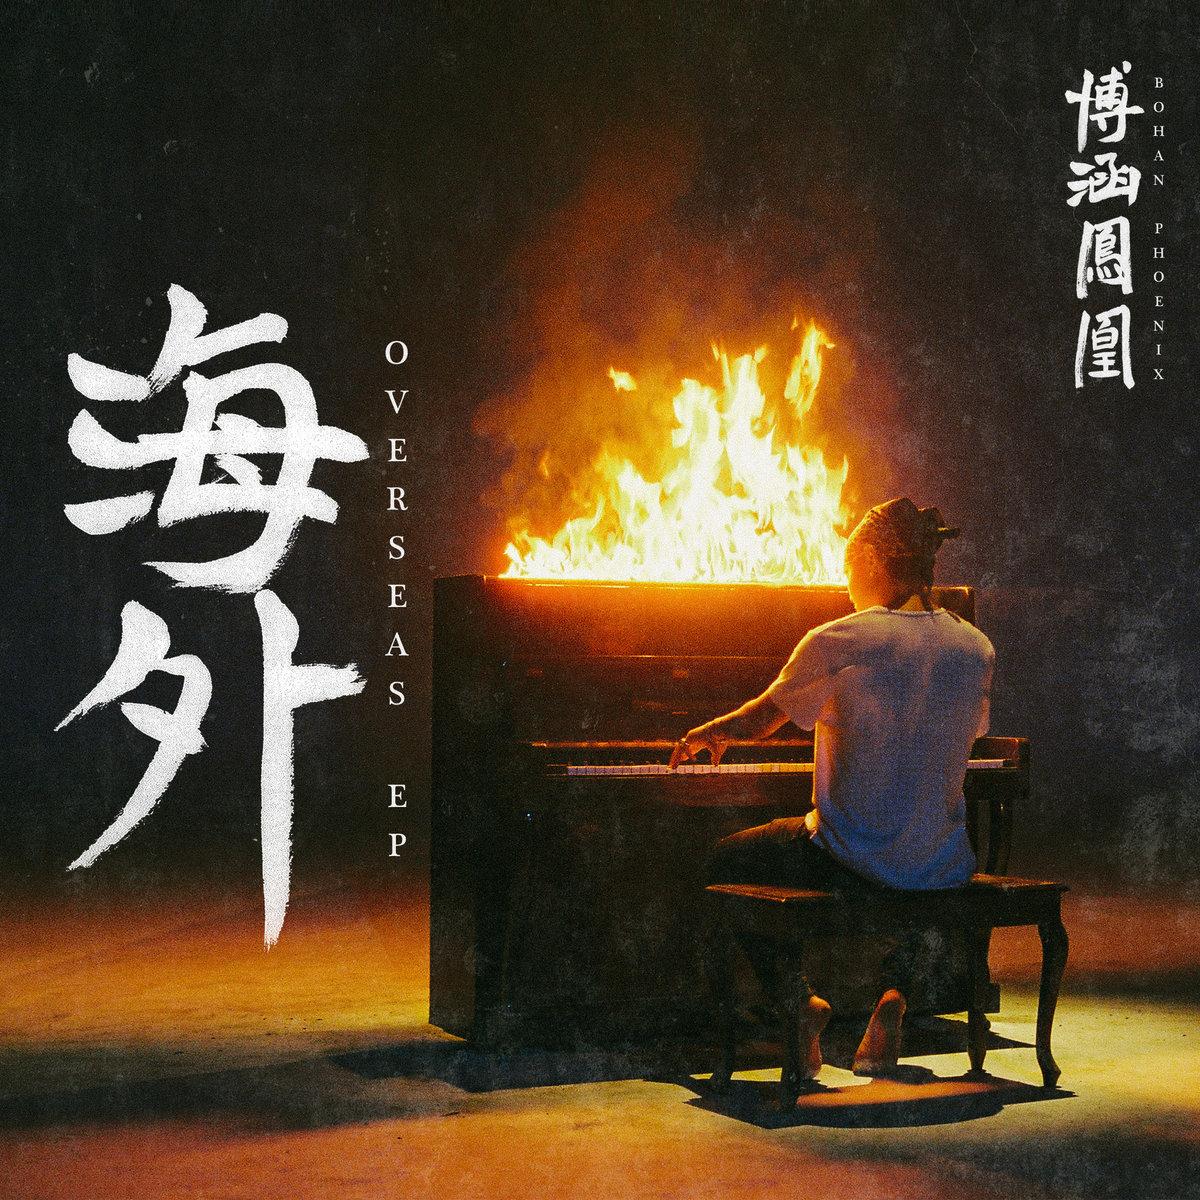 201804/album-reviews-Bohan-phoenix-overseas.jpg